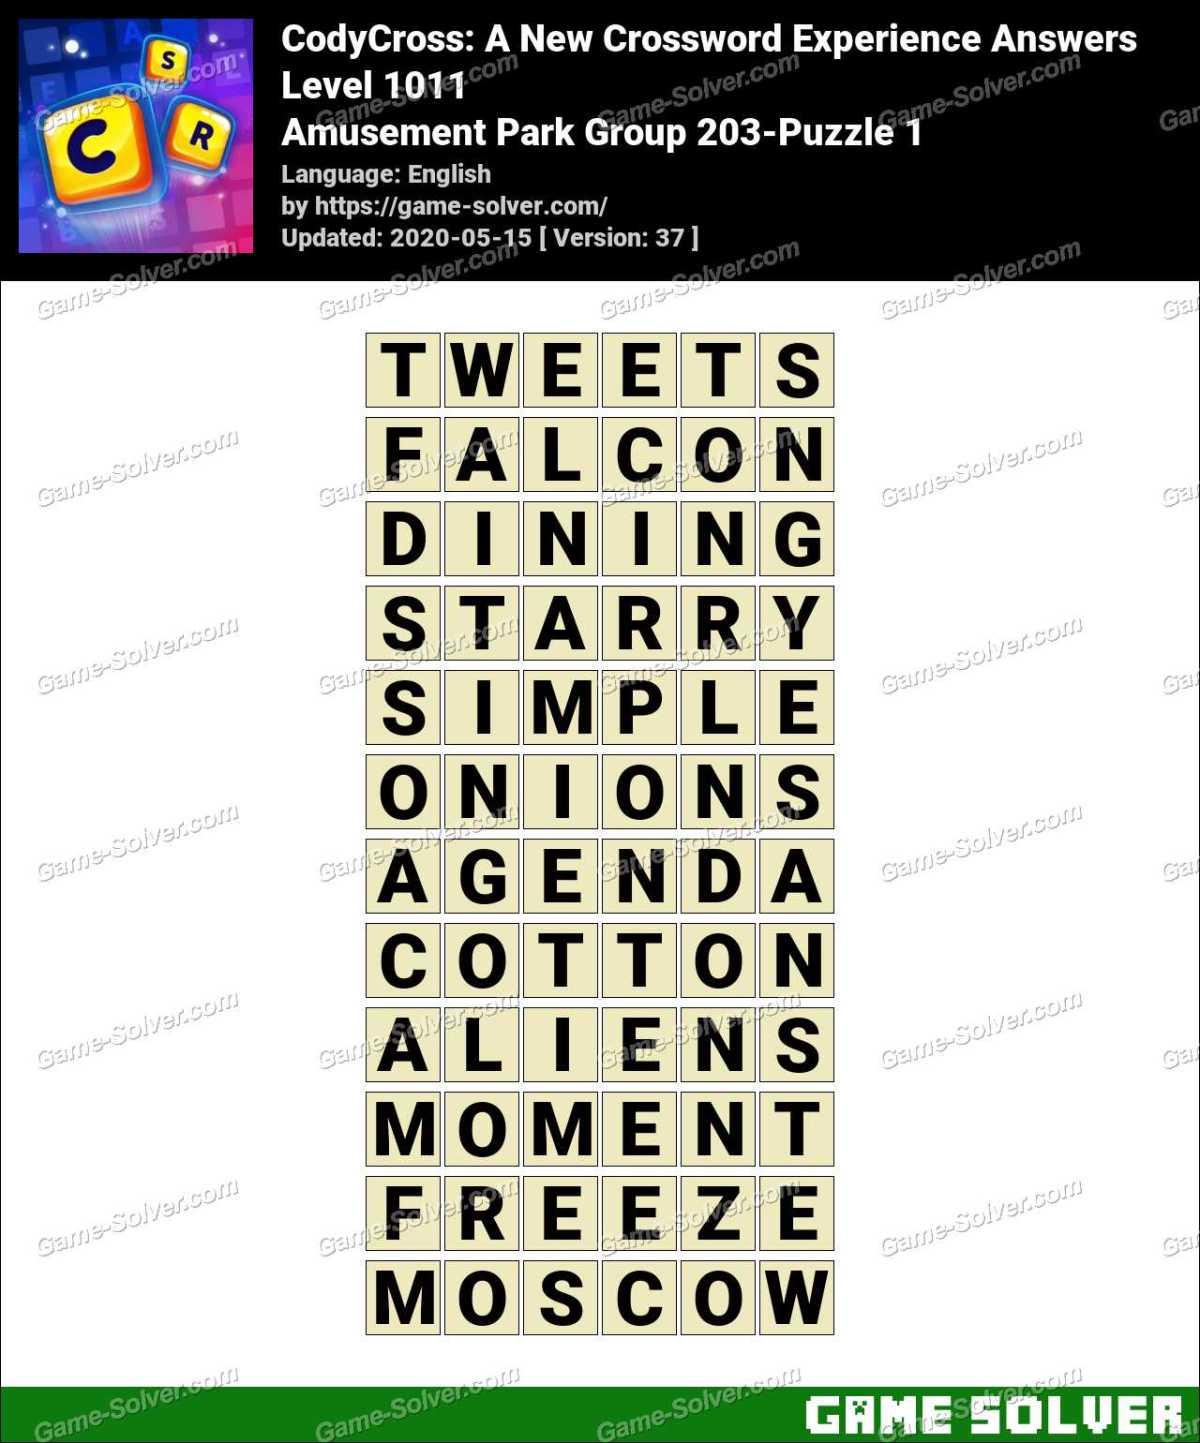 CodyCross Amusement Park Group 203-Puzzle 1 Answers